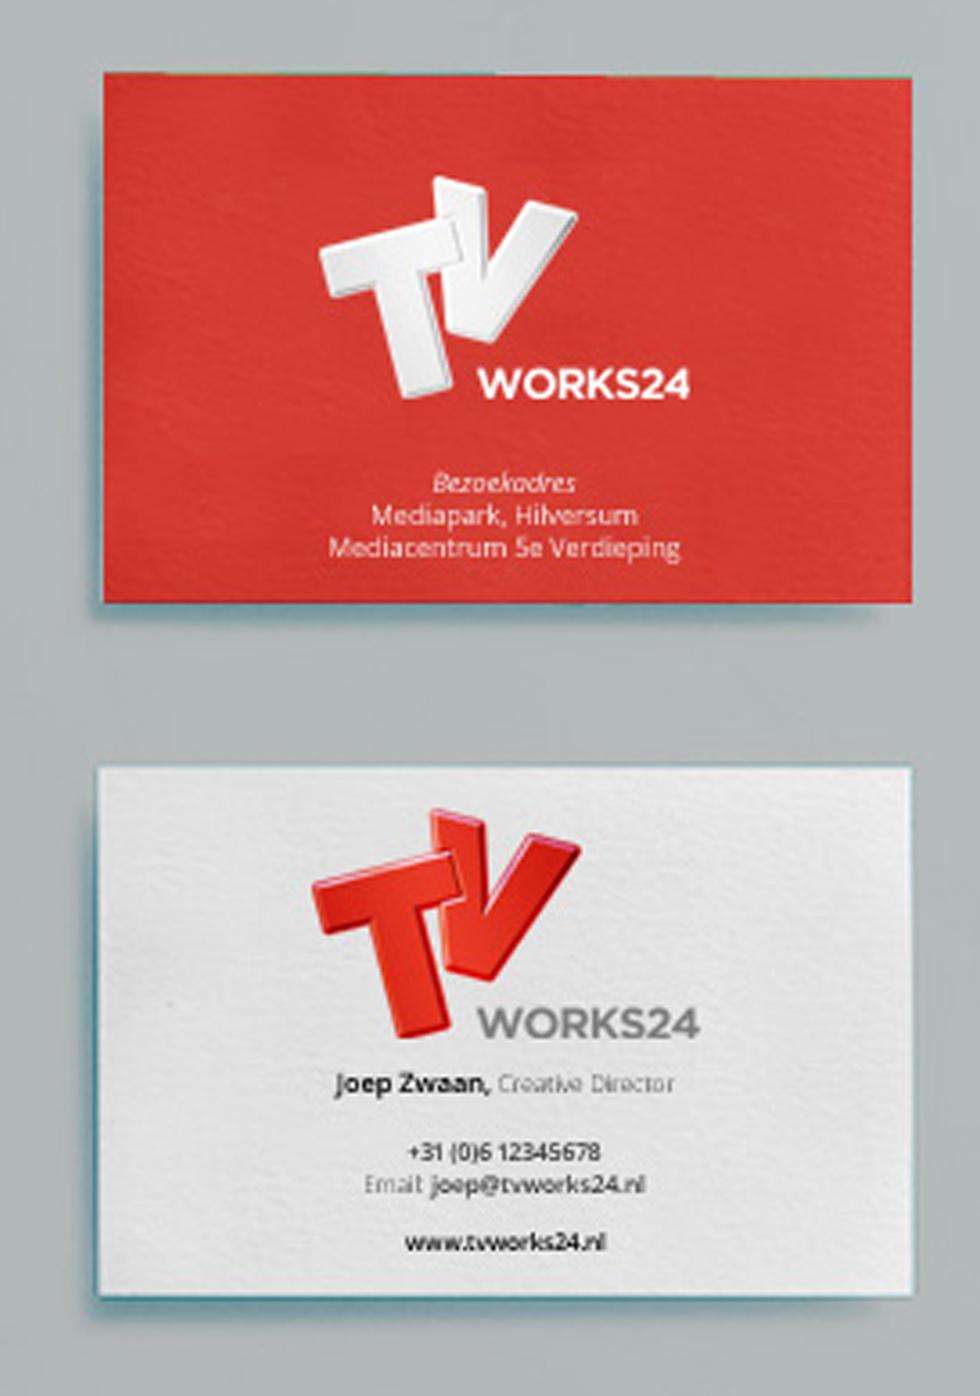 TVWorks24